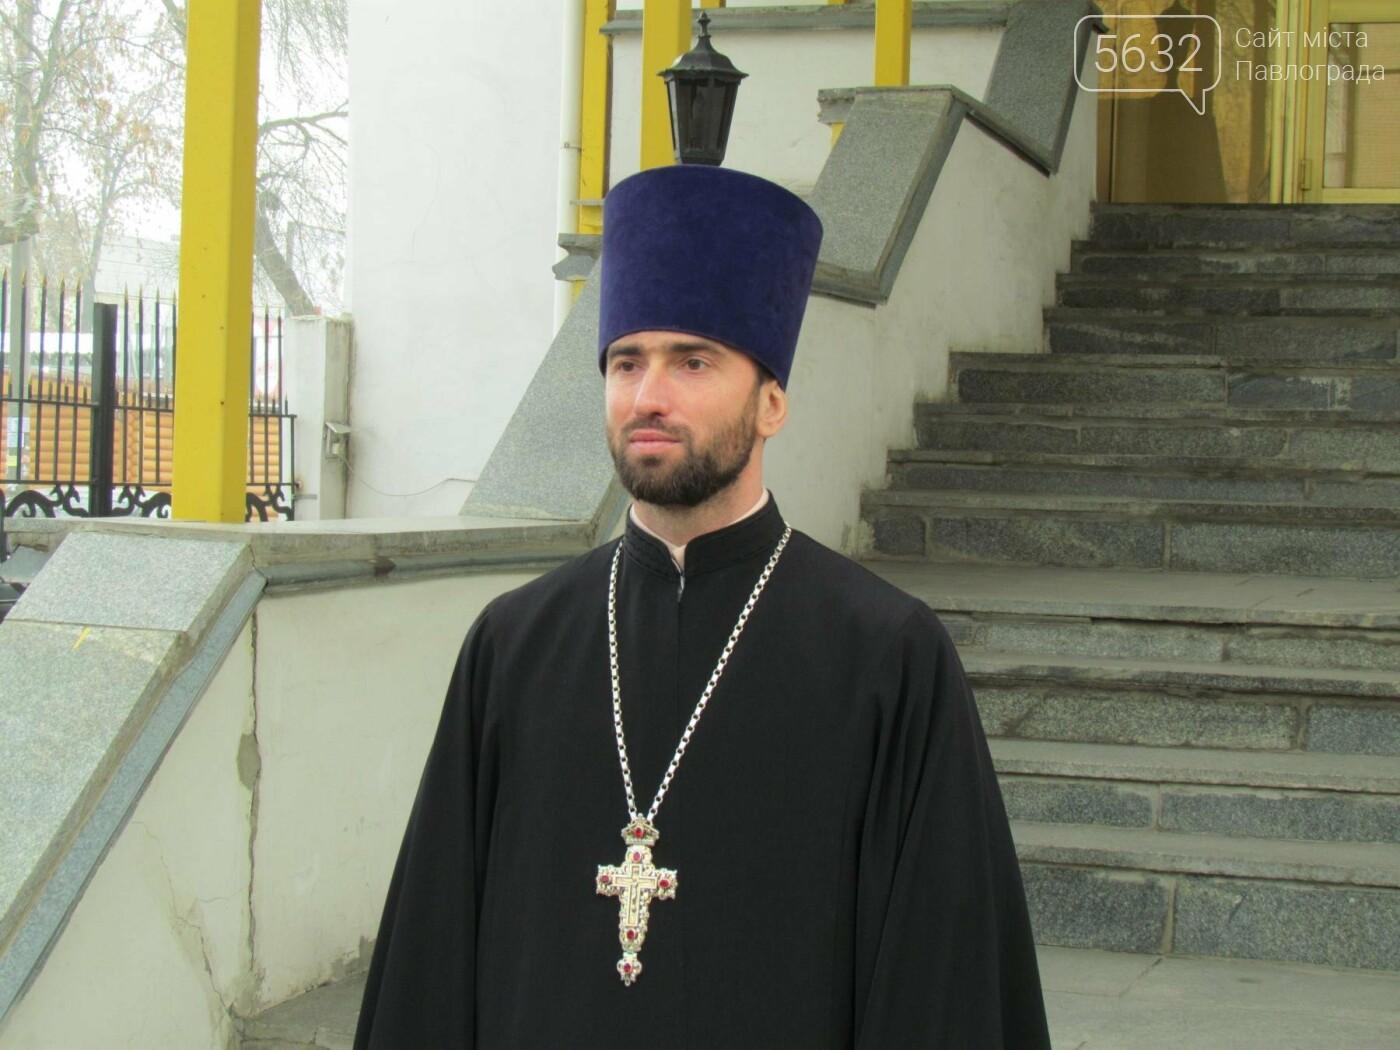 В Павлограде представили нового благочинного церковного округа, фото-1